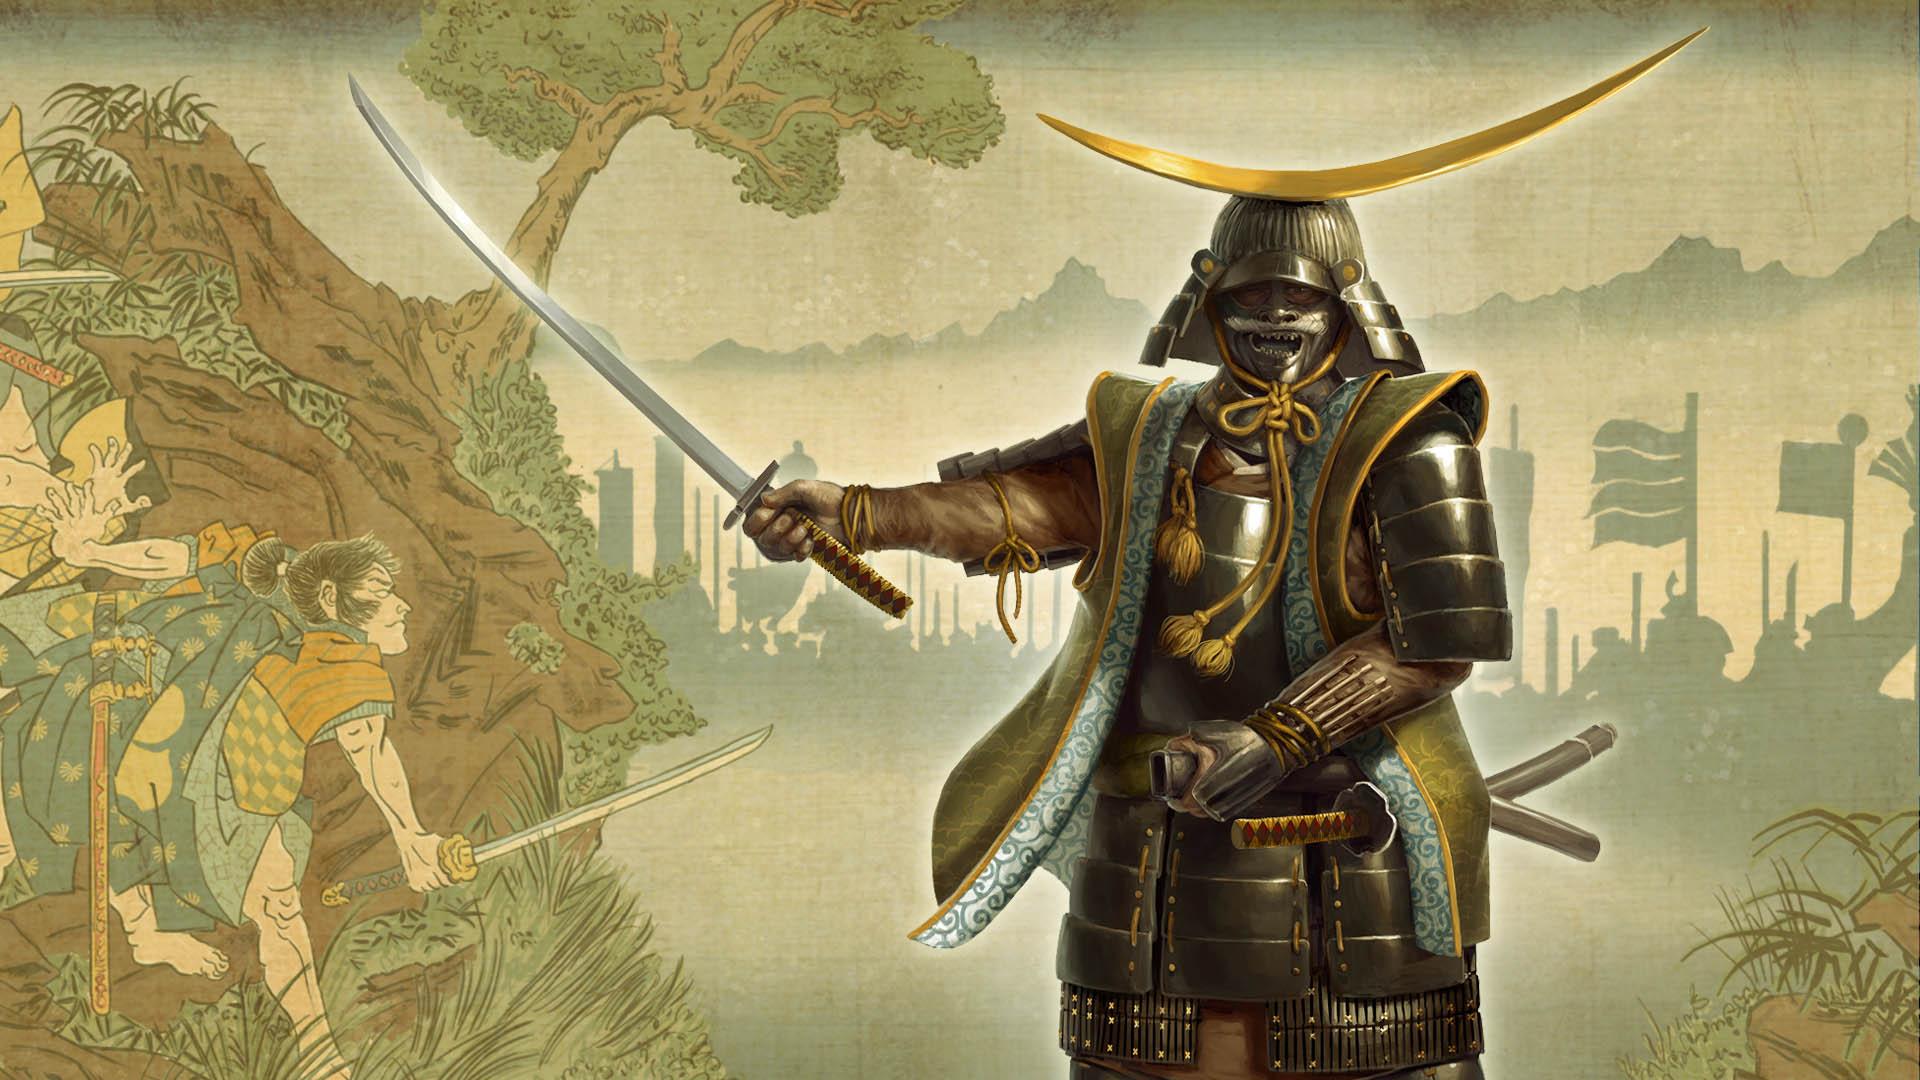 daimyo and shogun relationship quotes